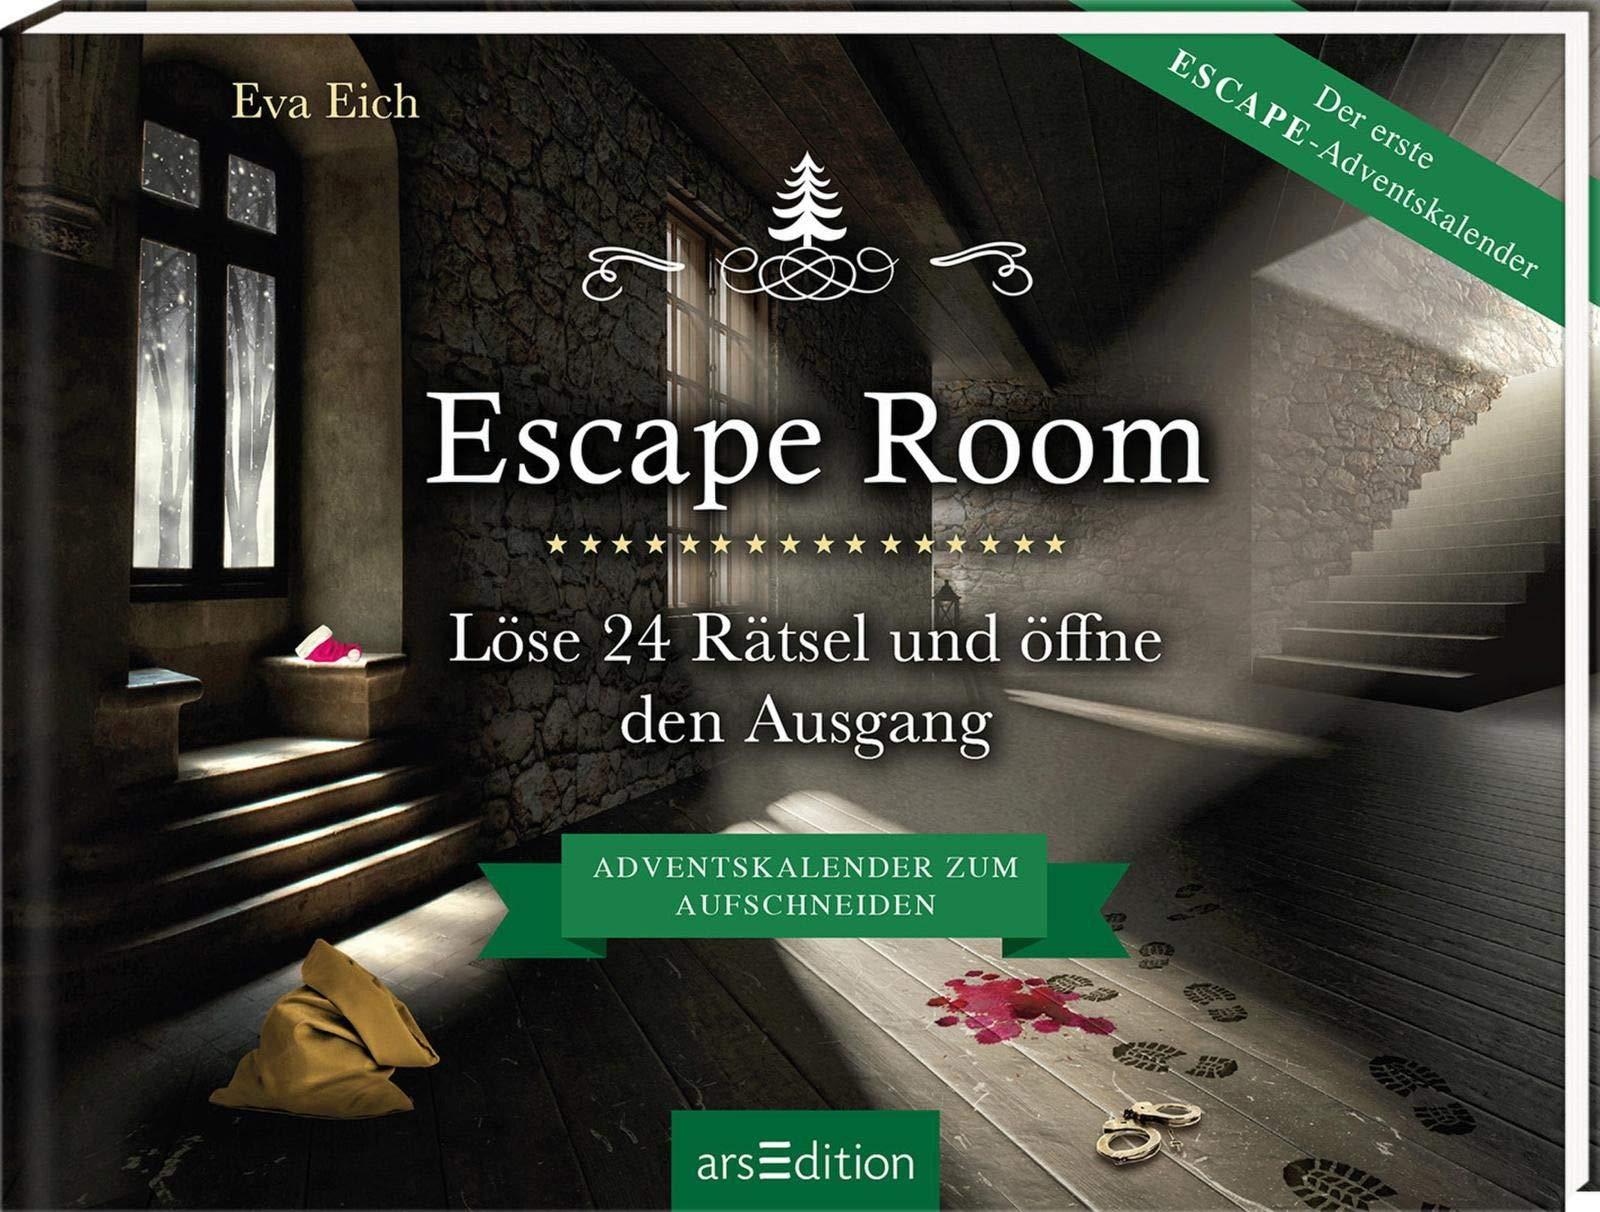 Escape Room Adventskalender - auch so etwas gibt es. (Foto: arsEdition)